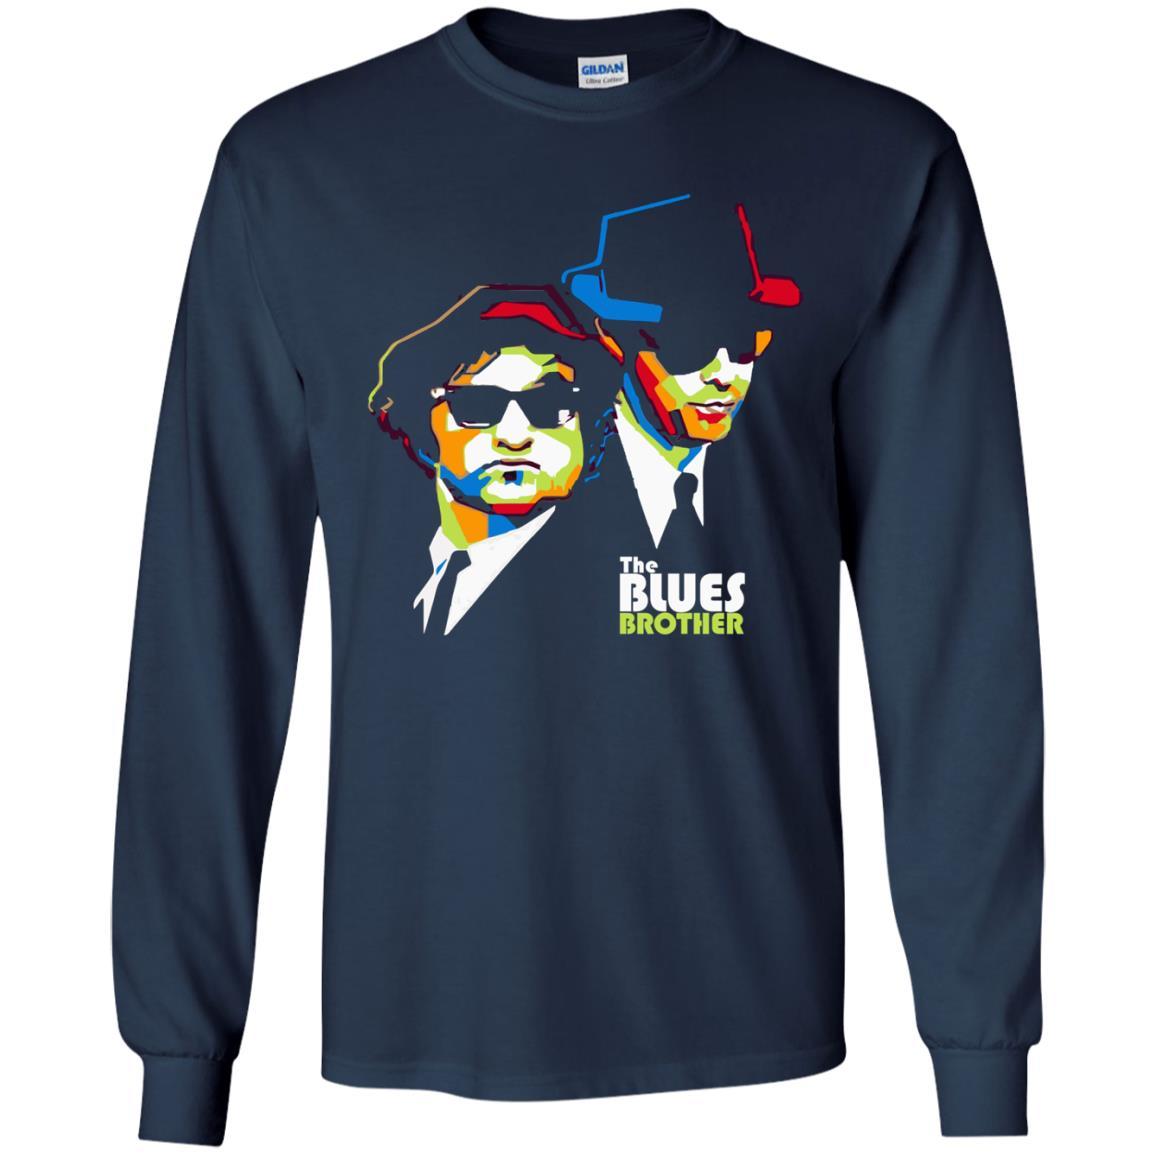 image 642 - The Blues Brother Shirt, Sweatshirt, Hoodie